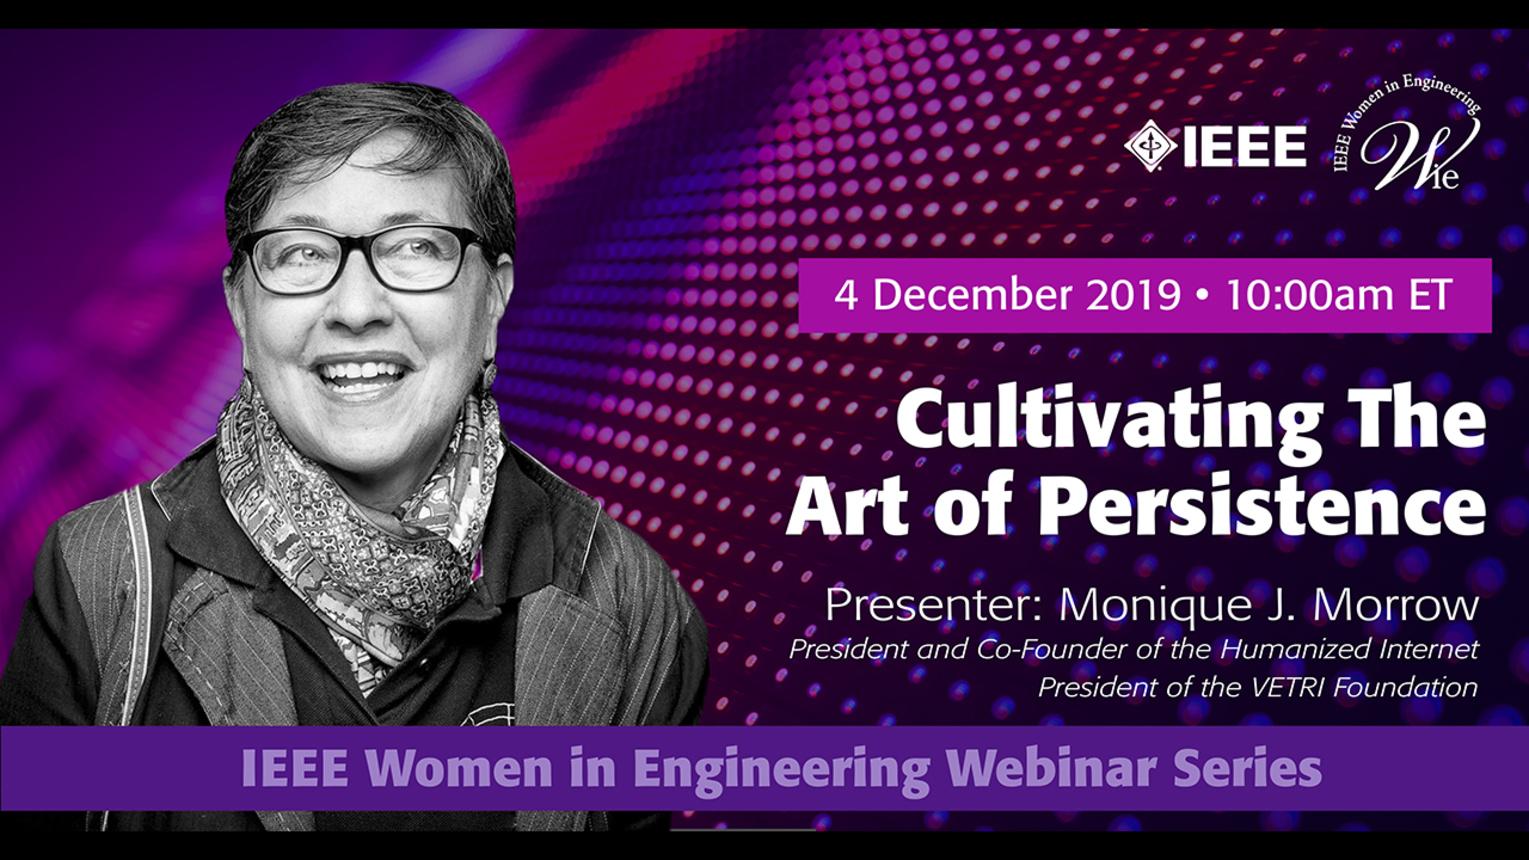 Cultivating the Art of Persistence - Monique Morrow - IEEE WIE Webinar Series